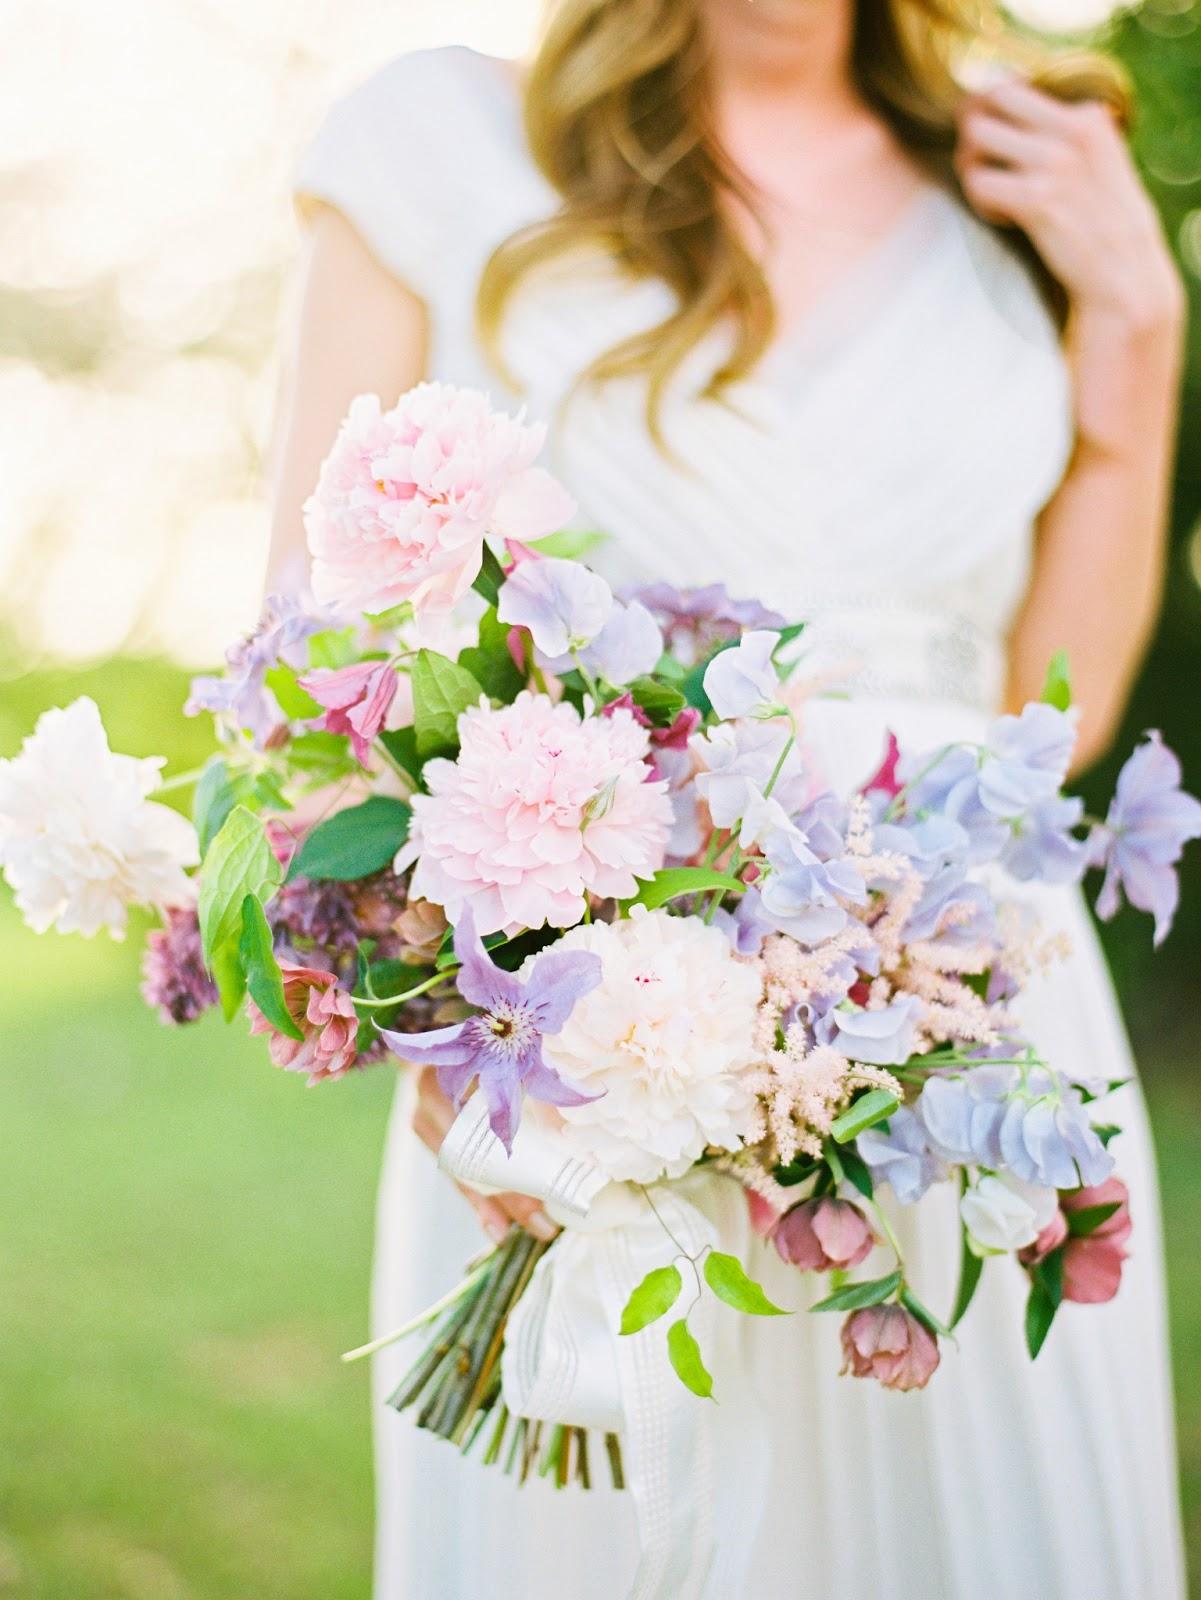 rosa quartzo e azul serenity - revista icasei